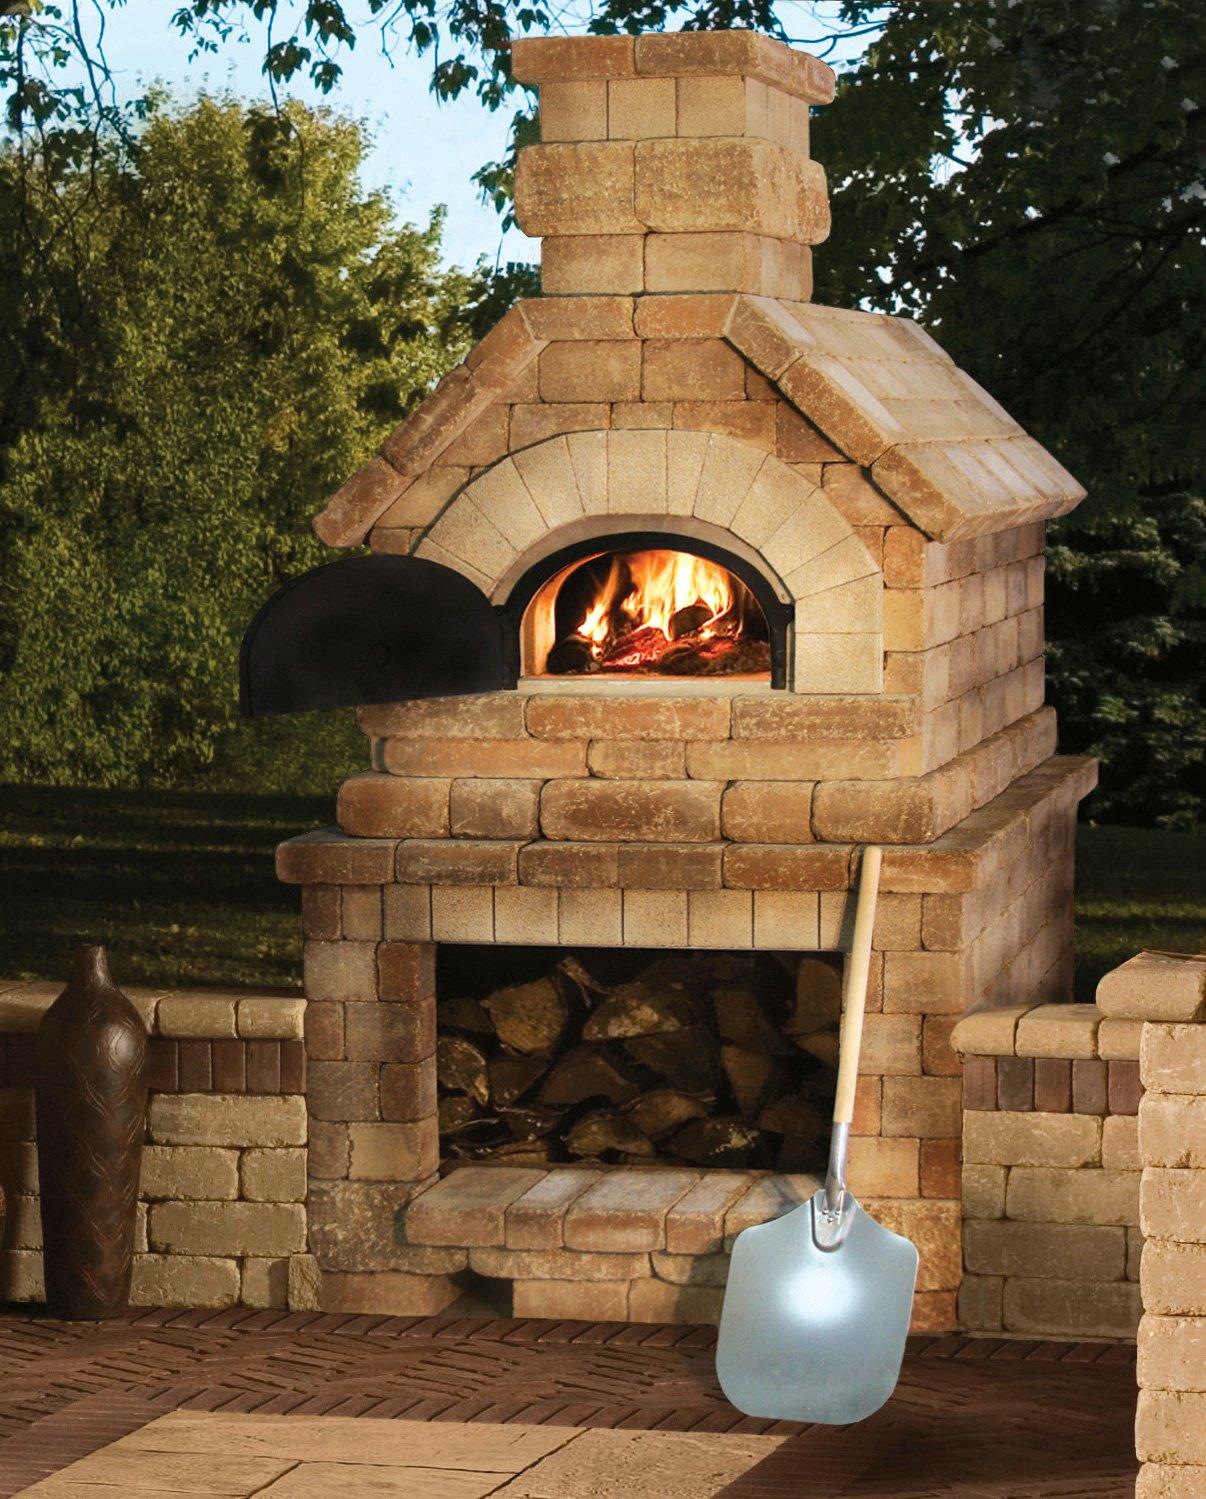 #MasterChefSweepstakes   Brick pizza oven, Pizza oven ...